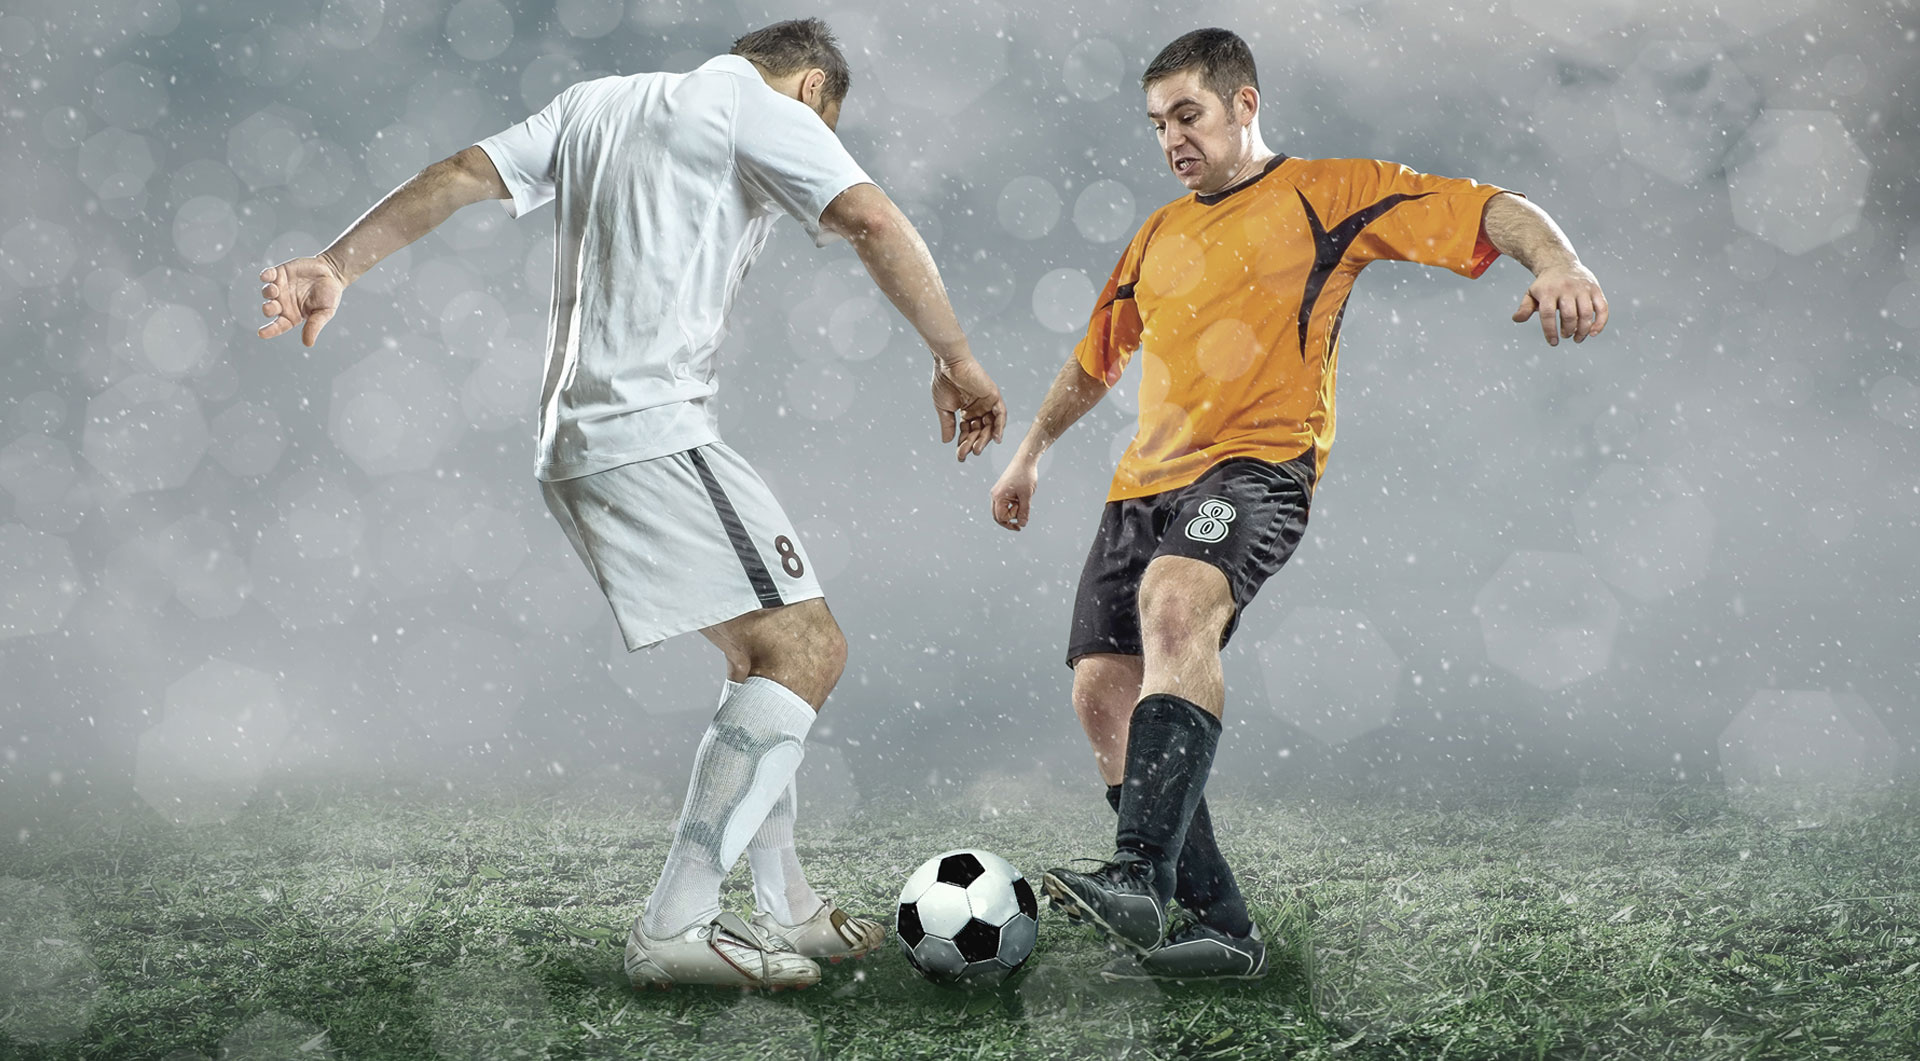 watch-tomas-berdych-vs-lleyton-hewitt-round-1-us-open-online